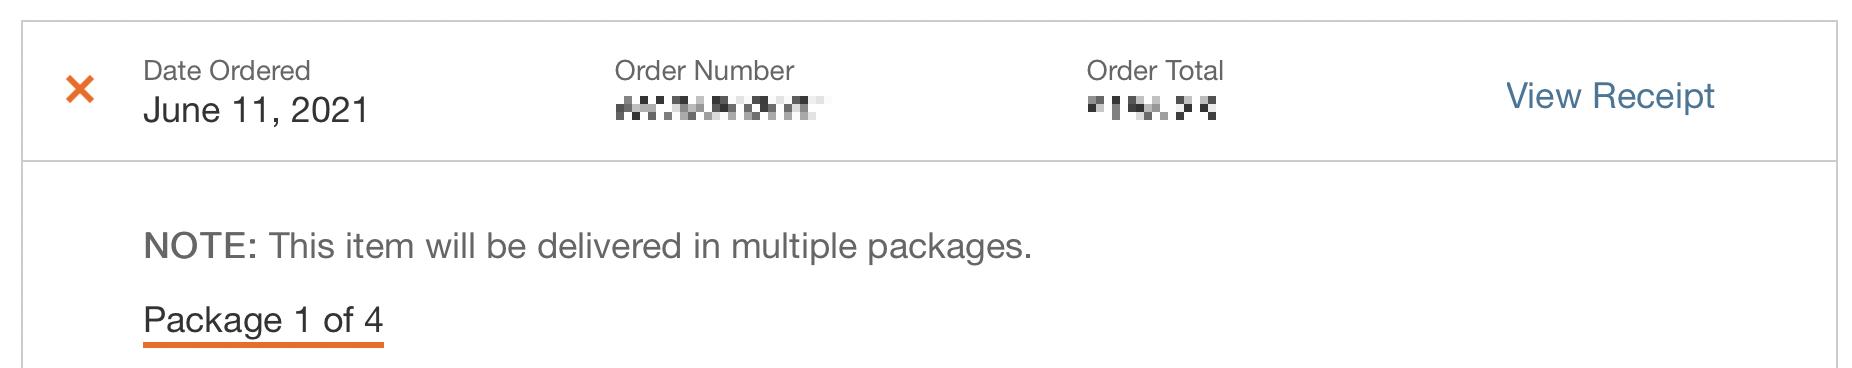 Home Depot order summary